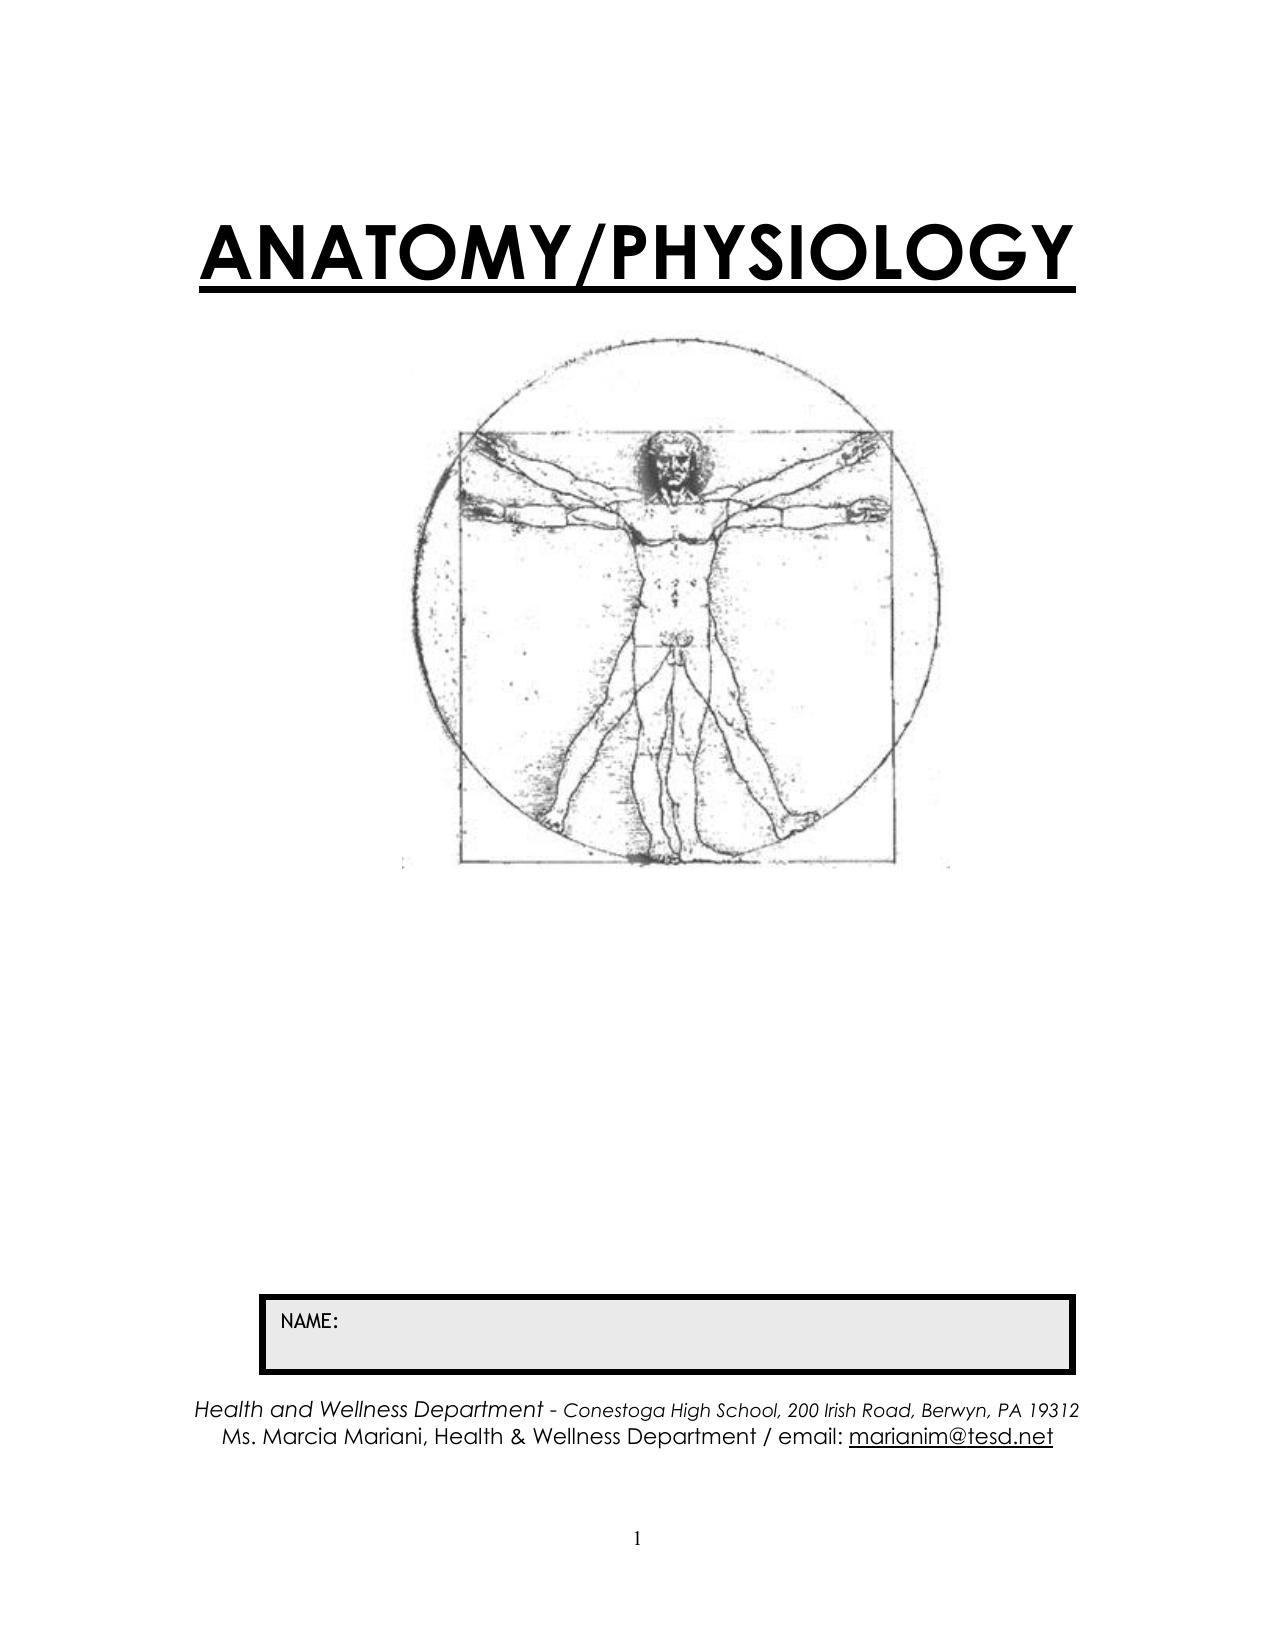 Anatomy & Physiology Worksheet